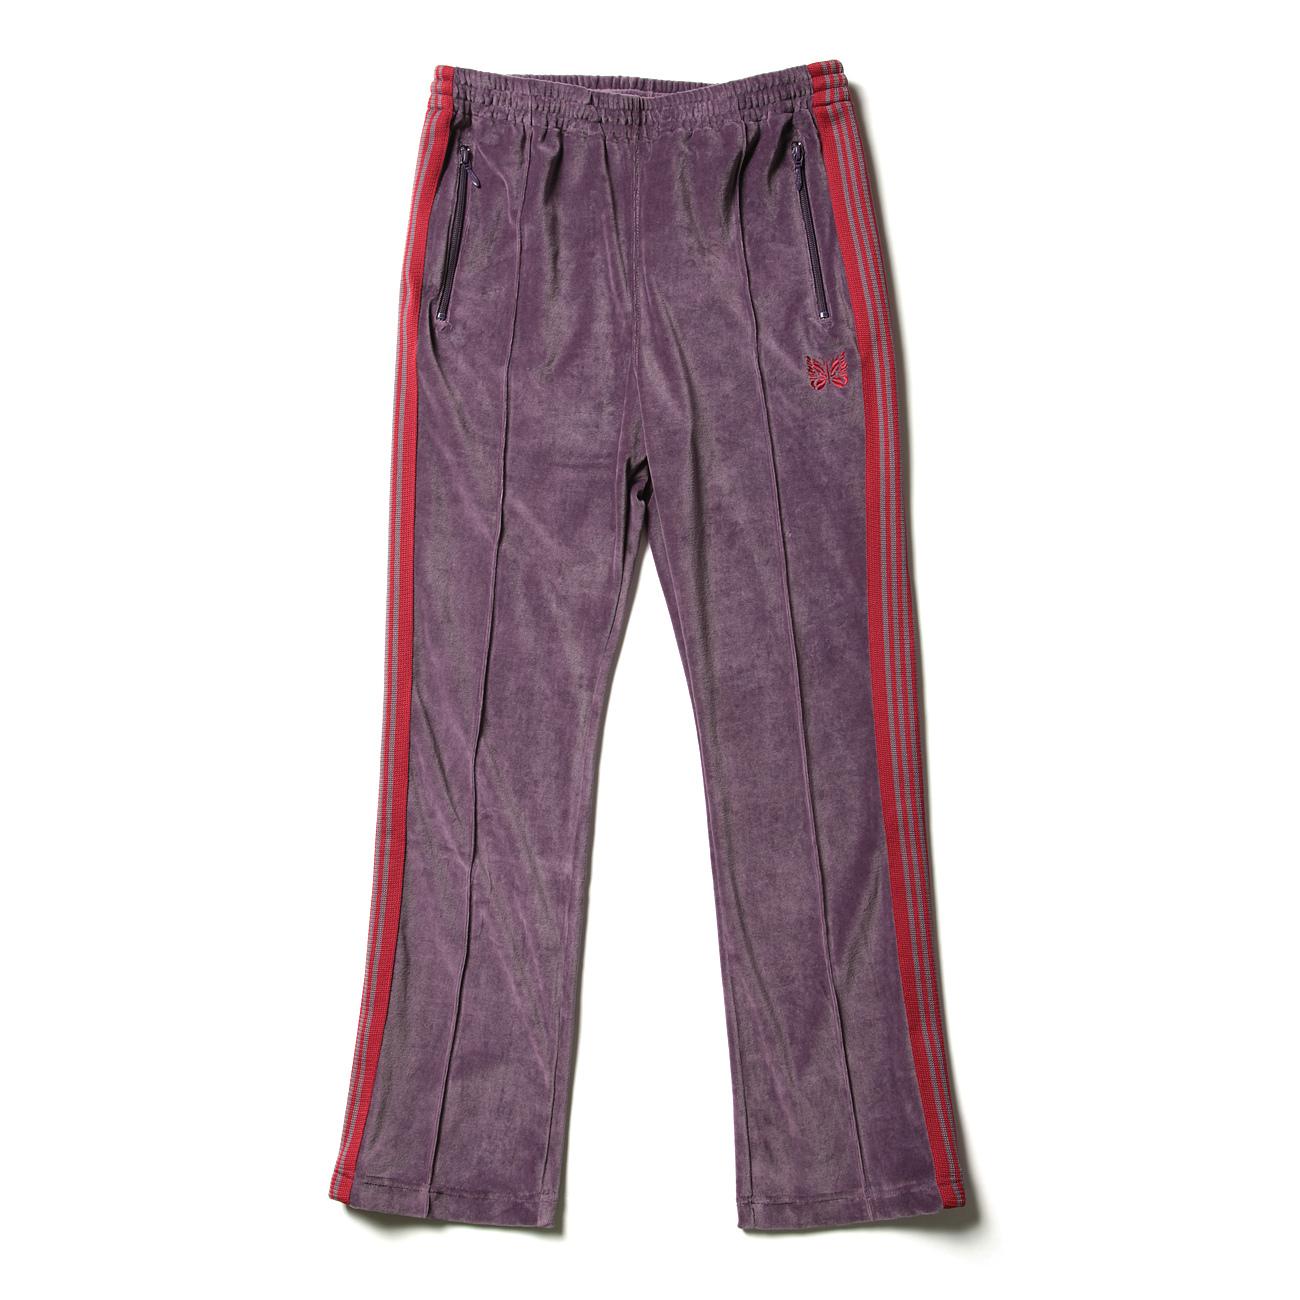 Needles / Narrow Track Pant - C/Pe Velour - Purple